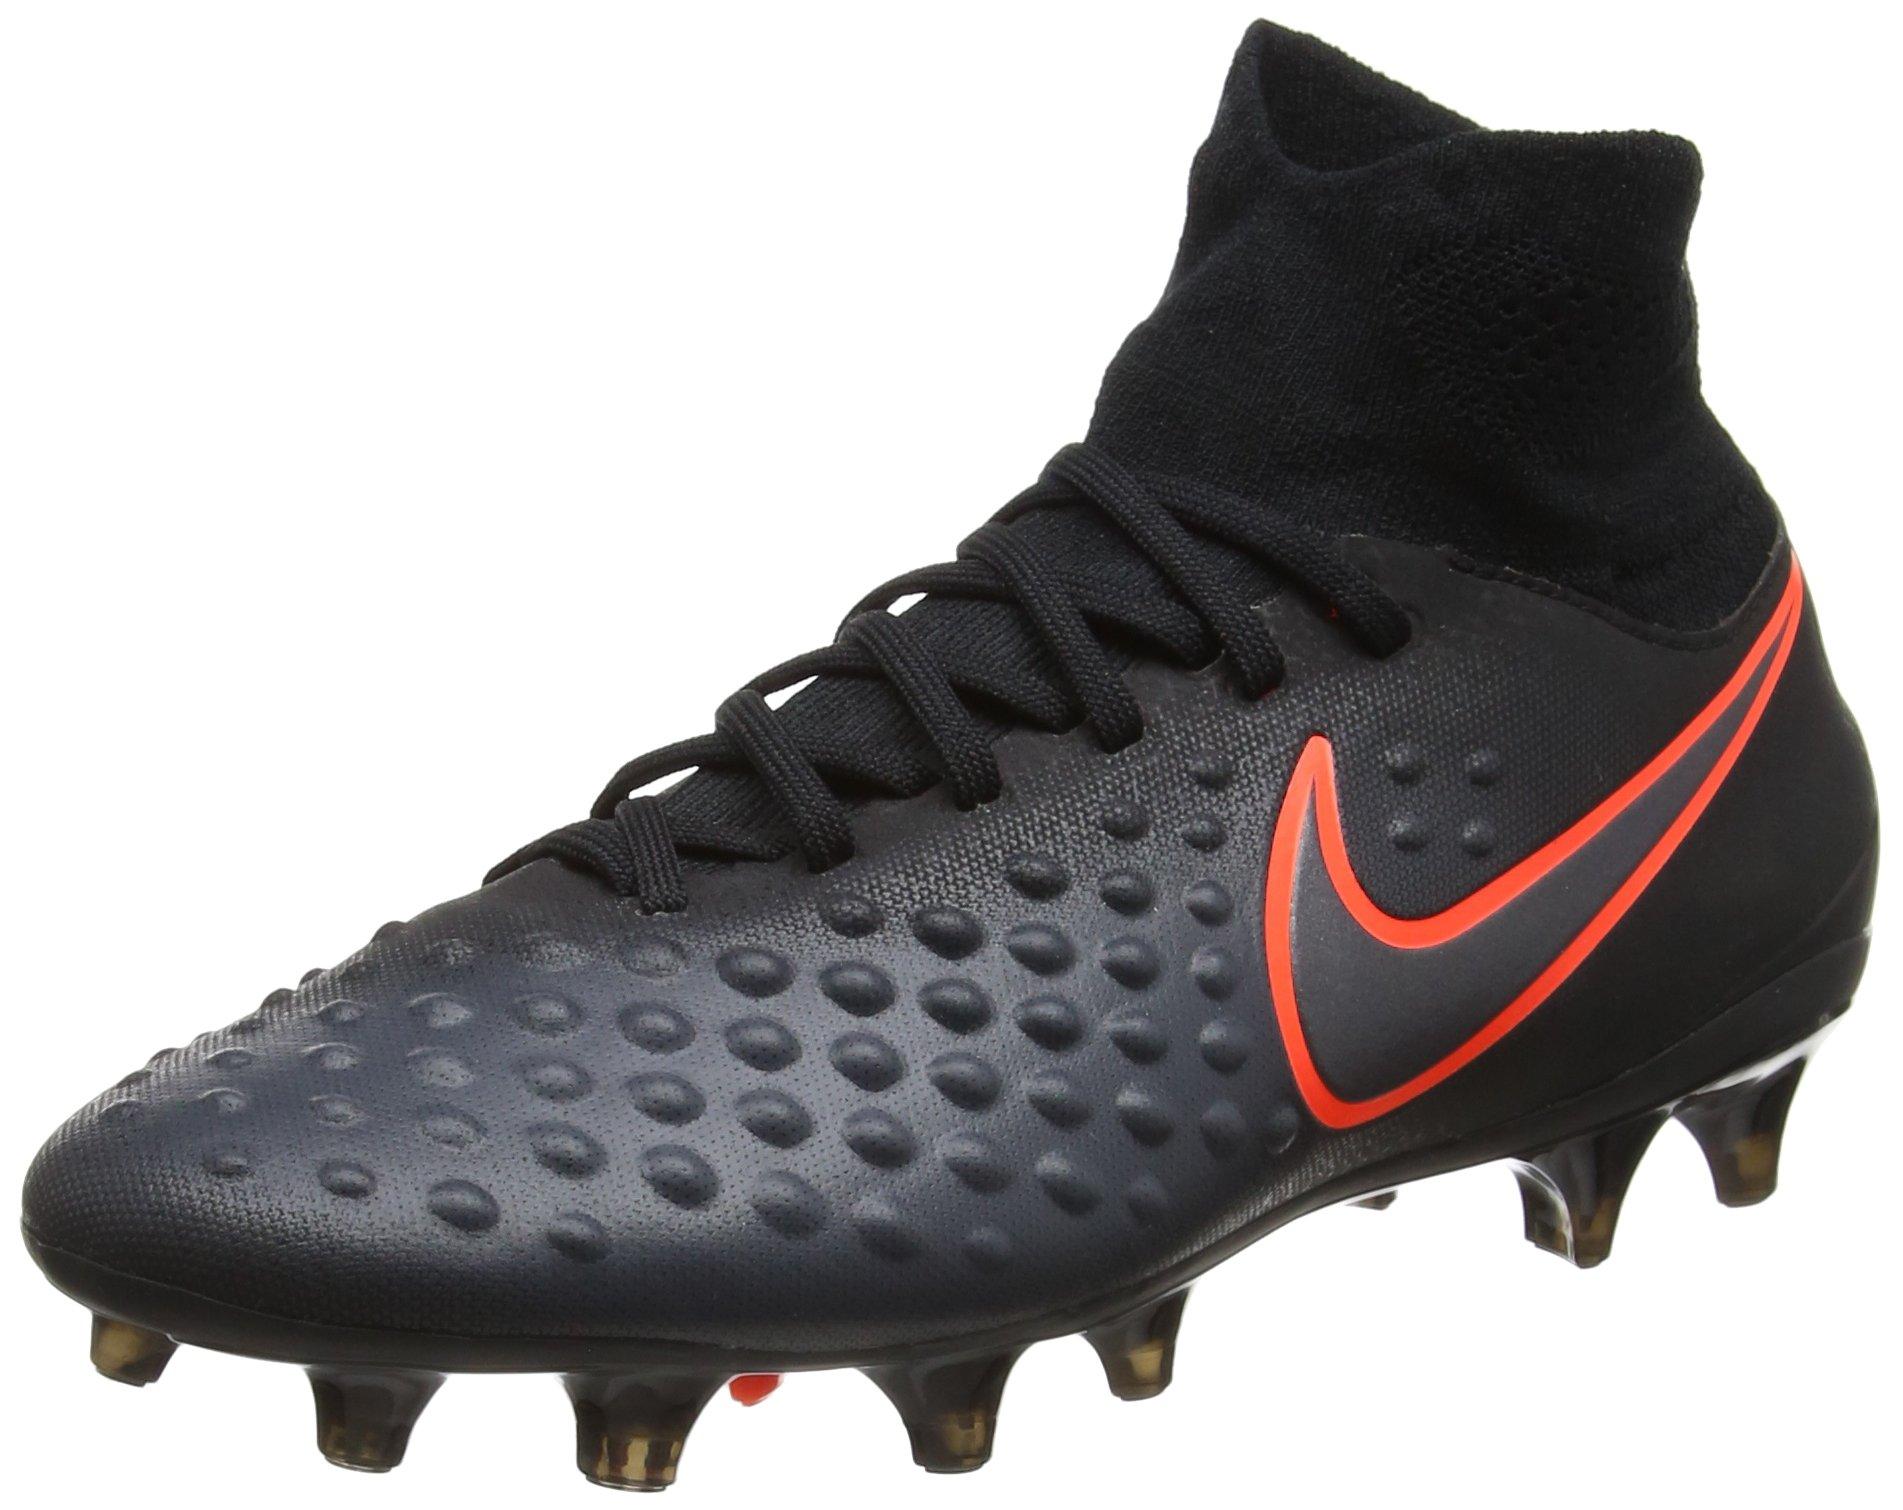 Nike Kids Magista Obra II FG Black/Total Crimson Shoes - 4.5Y